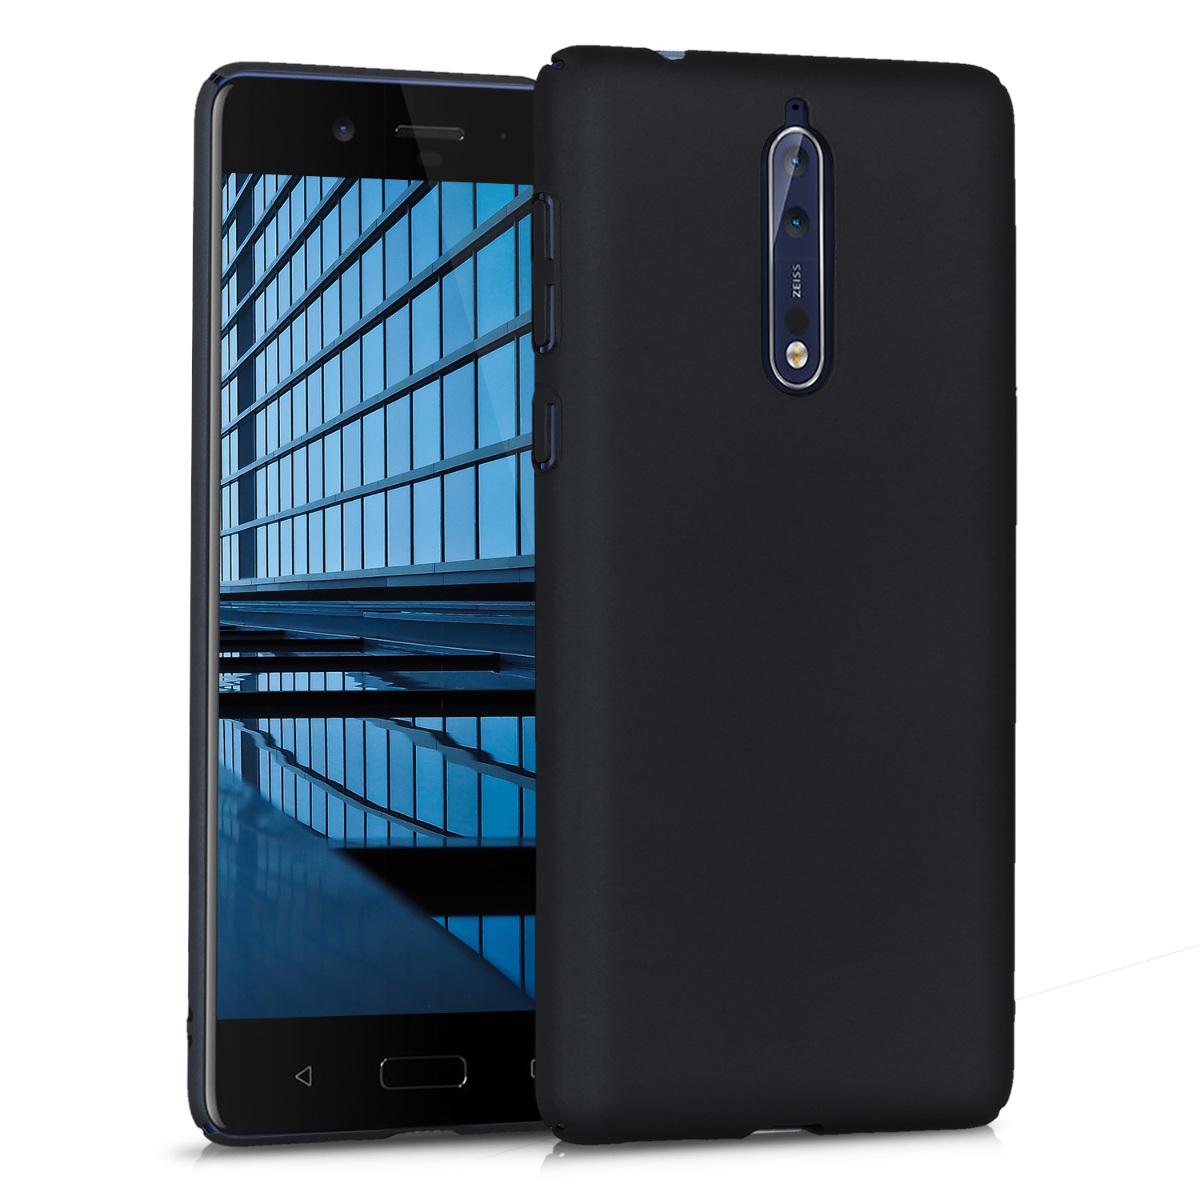 KW Slim Anti-Slip Cover - Σκληρή Θήκη Καουτσούκ Nokia 8 - Μαύρο (43239.47)